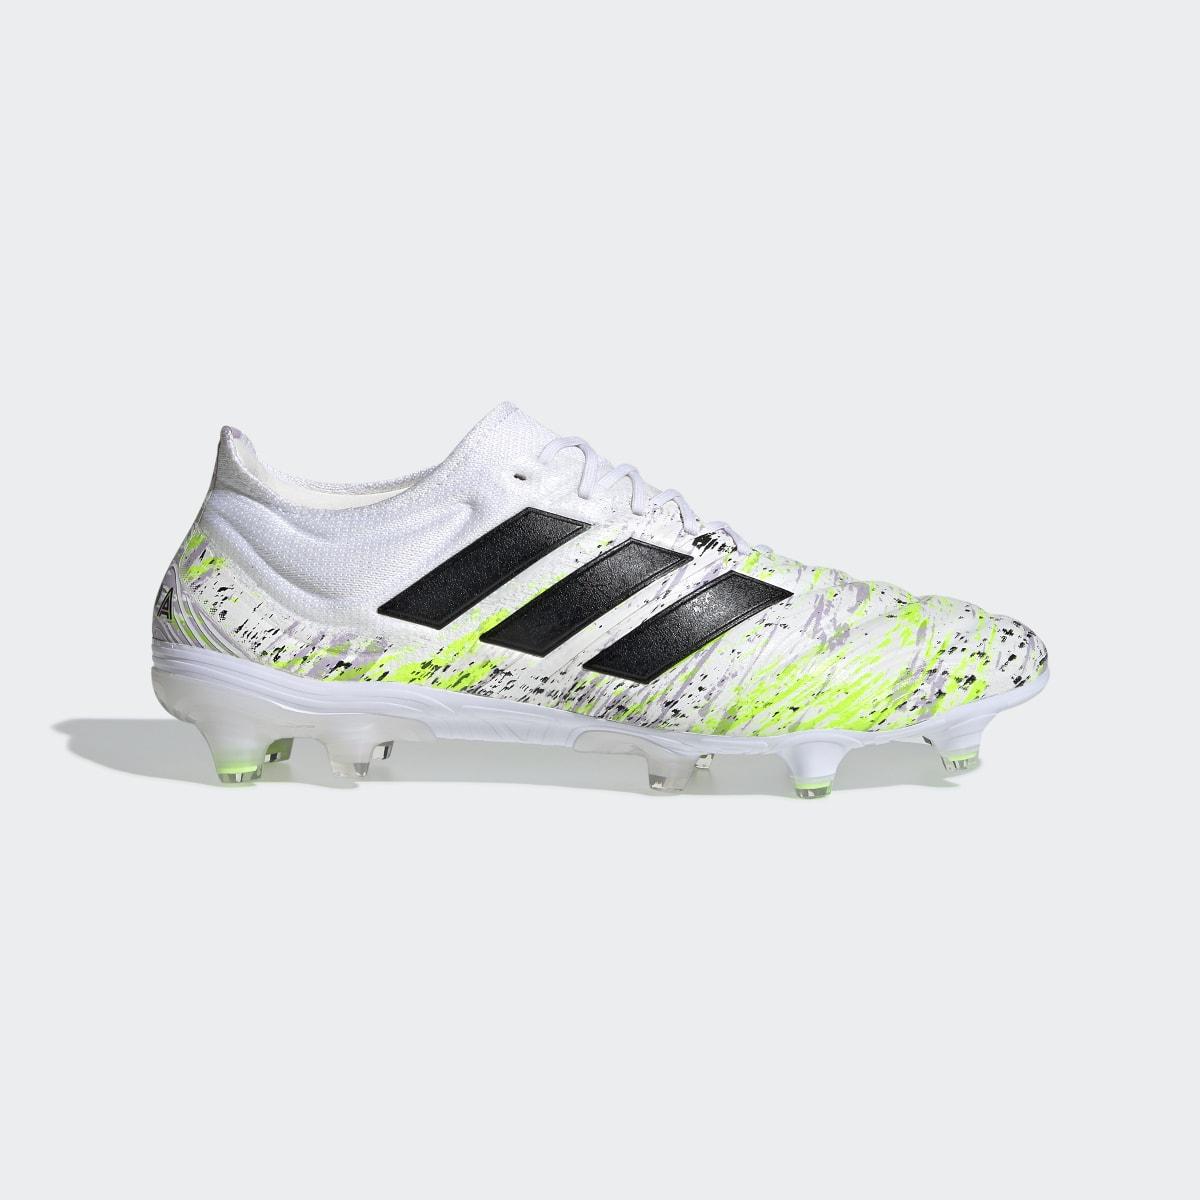 Botas de Futebol Copa 20.1 – Piso firme